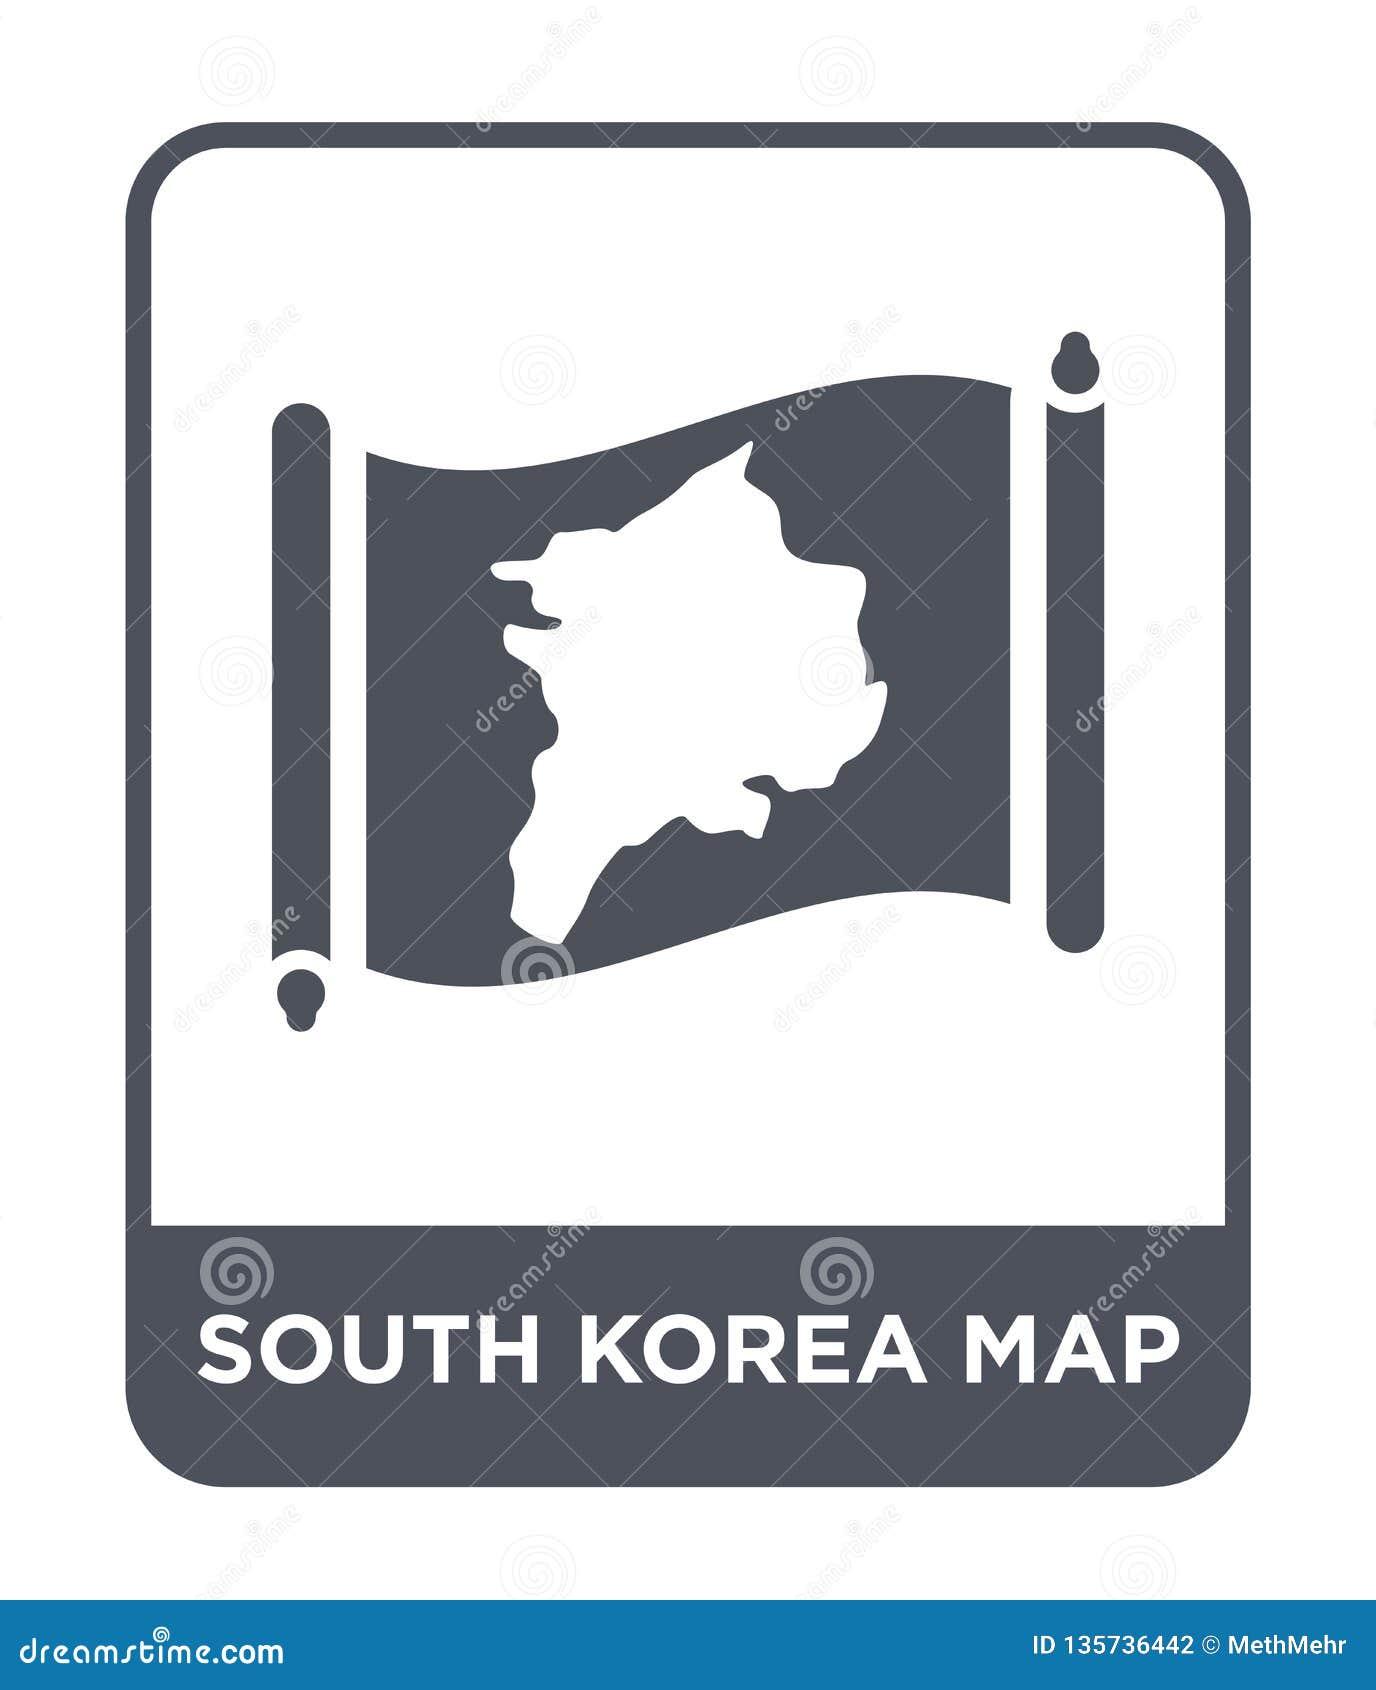 Korea Map App on korean war map, asia map, japan map, korean peninsula map, persia map, ireland map, euro countries map, china map, europe map, united states map, iran map, usa map, camp humphreys map, rwanda map, hong kong map, wwii map, russia map, formosa map, seoul map,